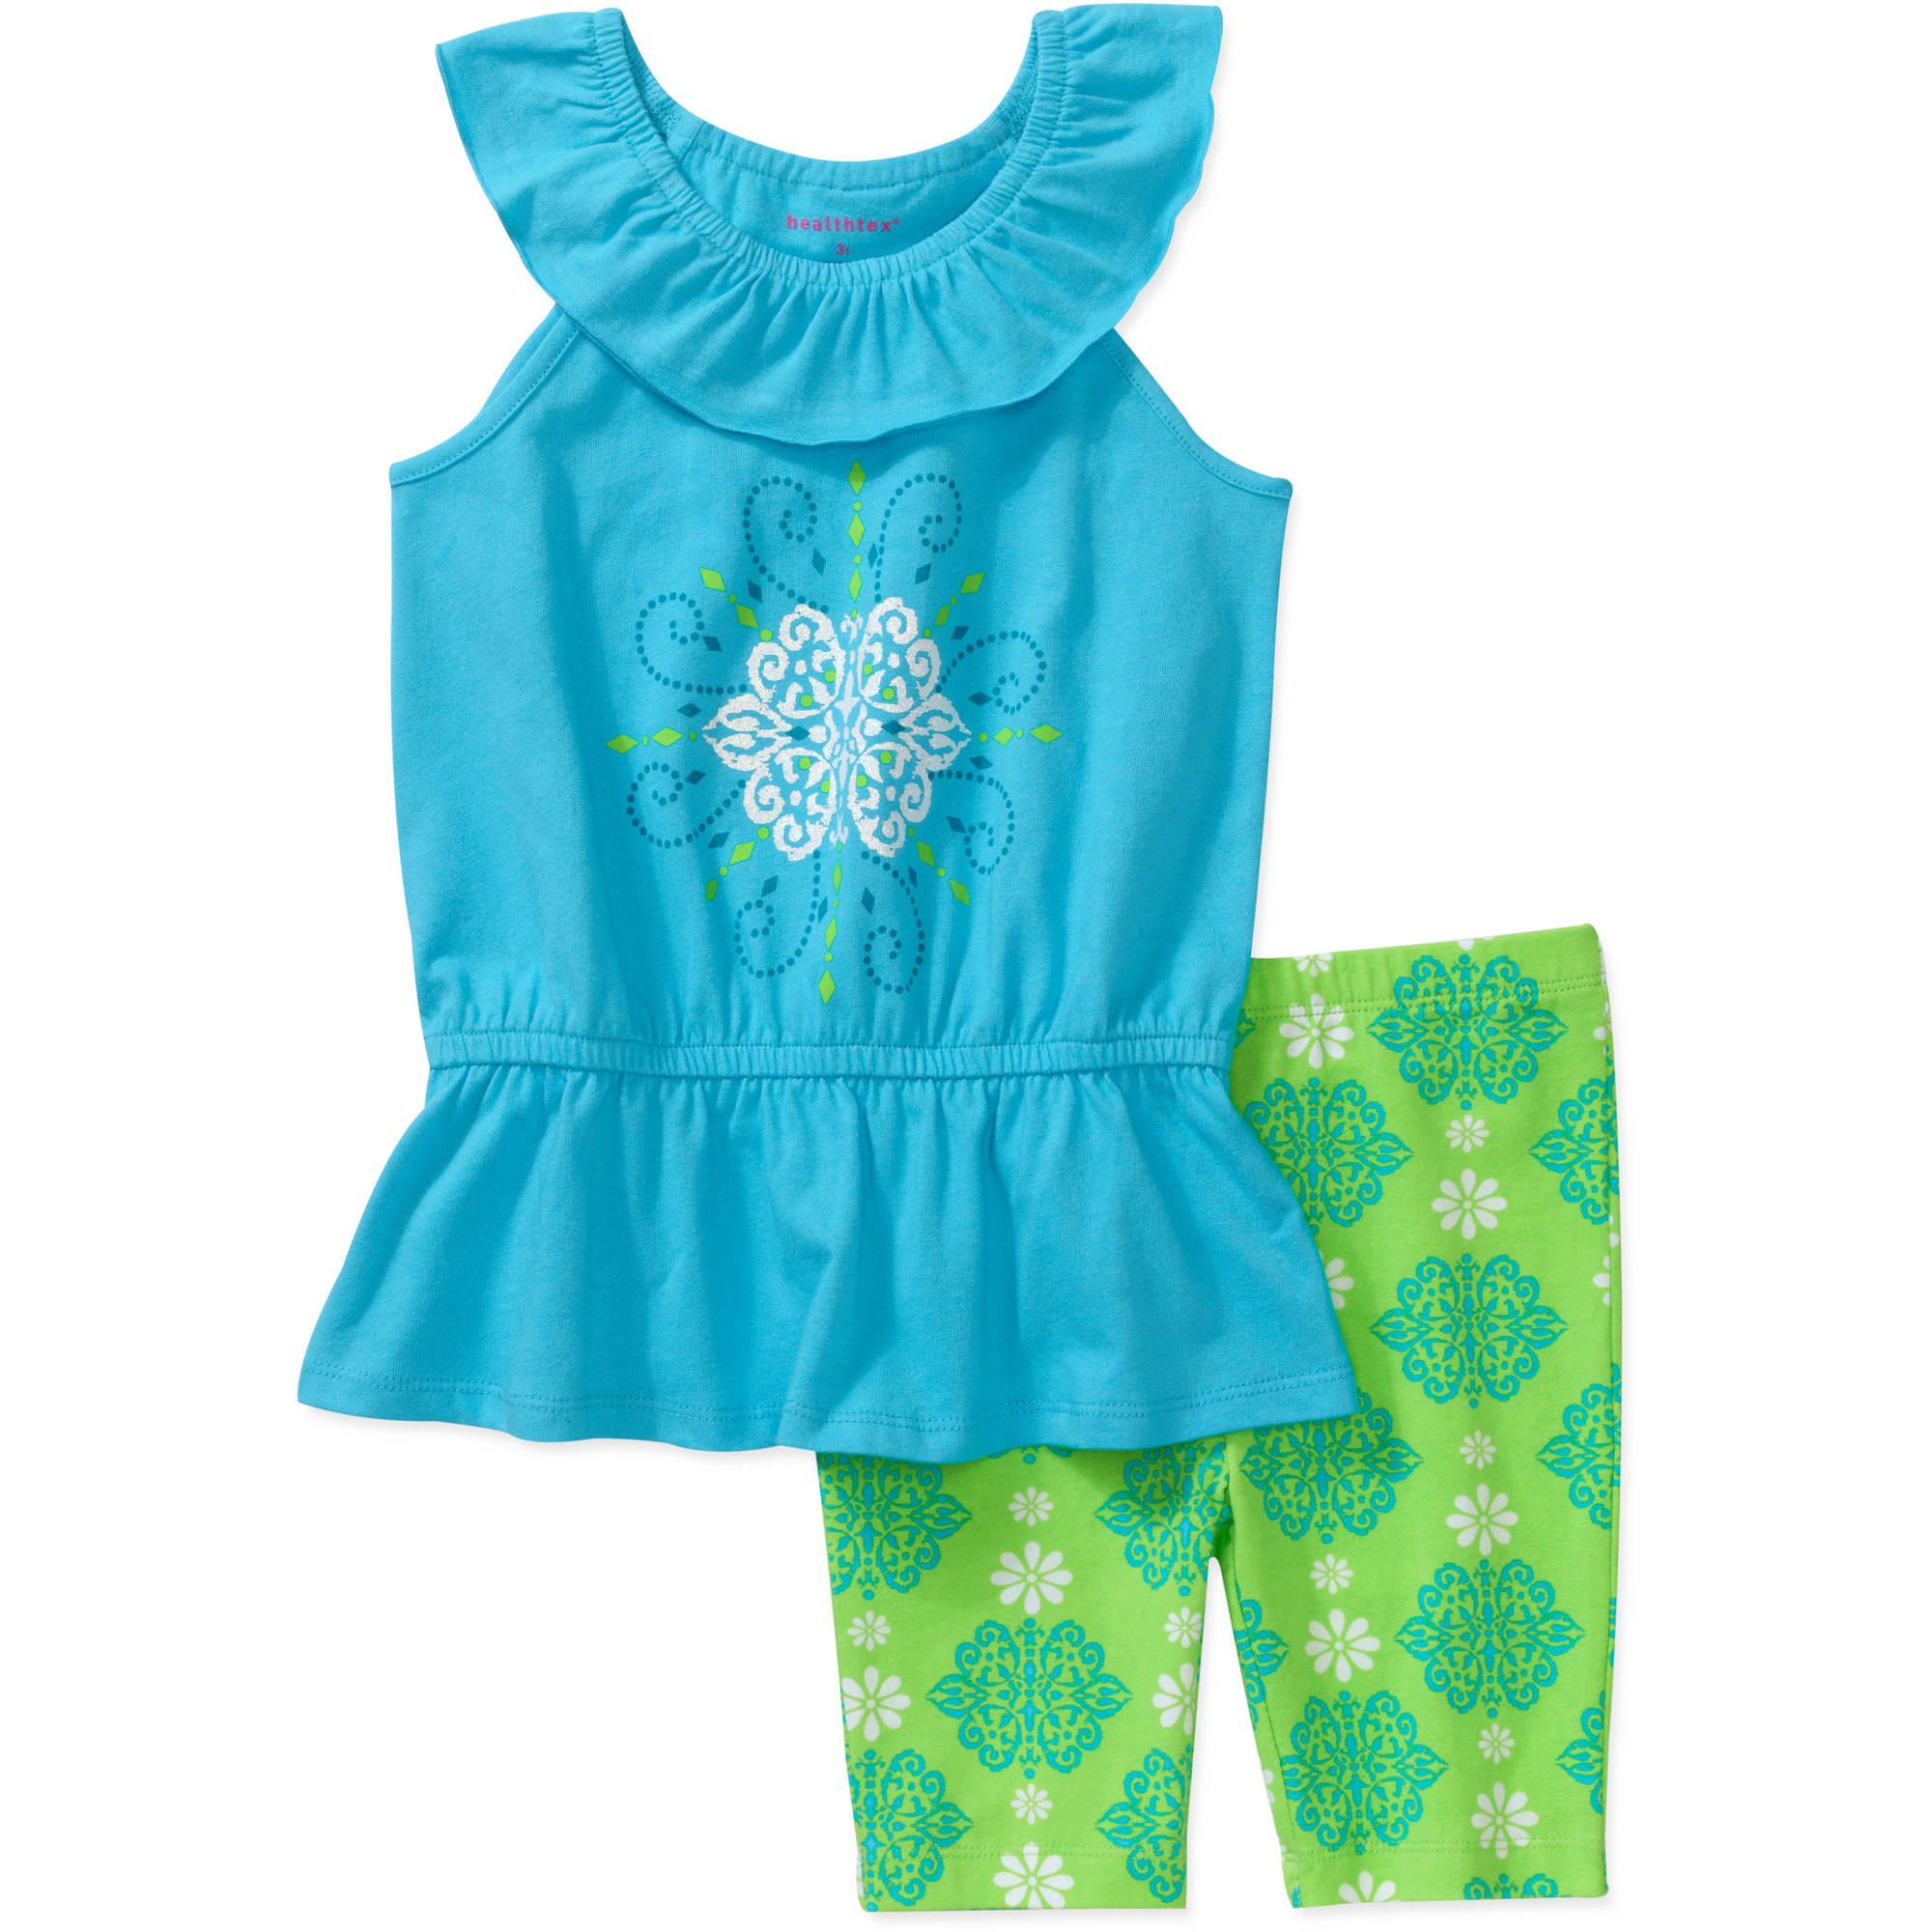 Healthtex Baby Girls' 2 Piece Drop Waist Tunic and Short Set